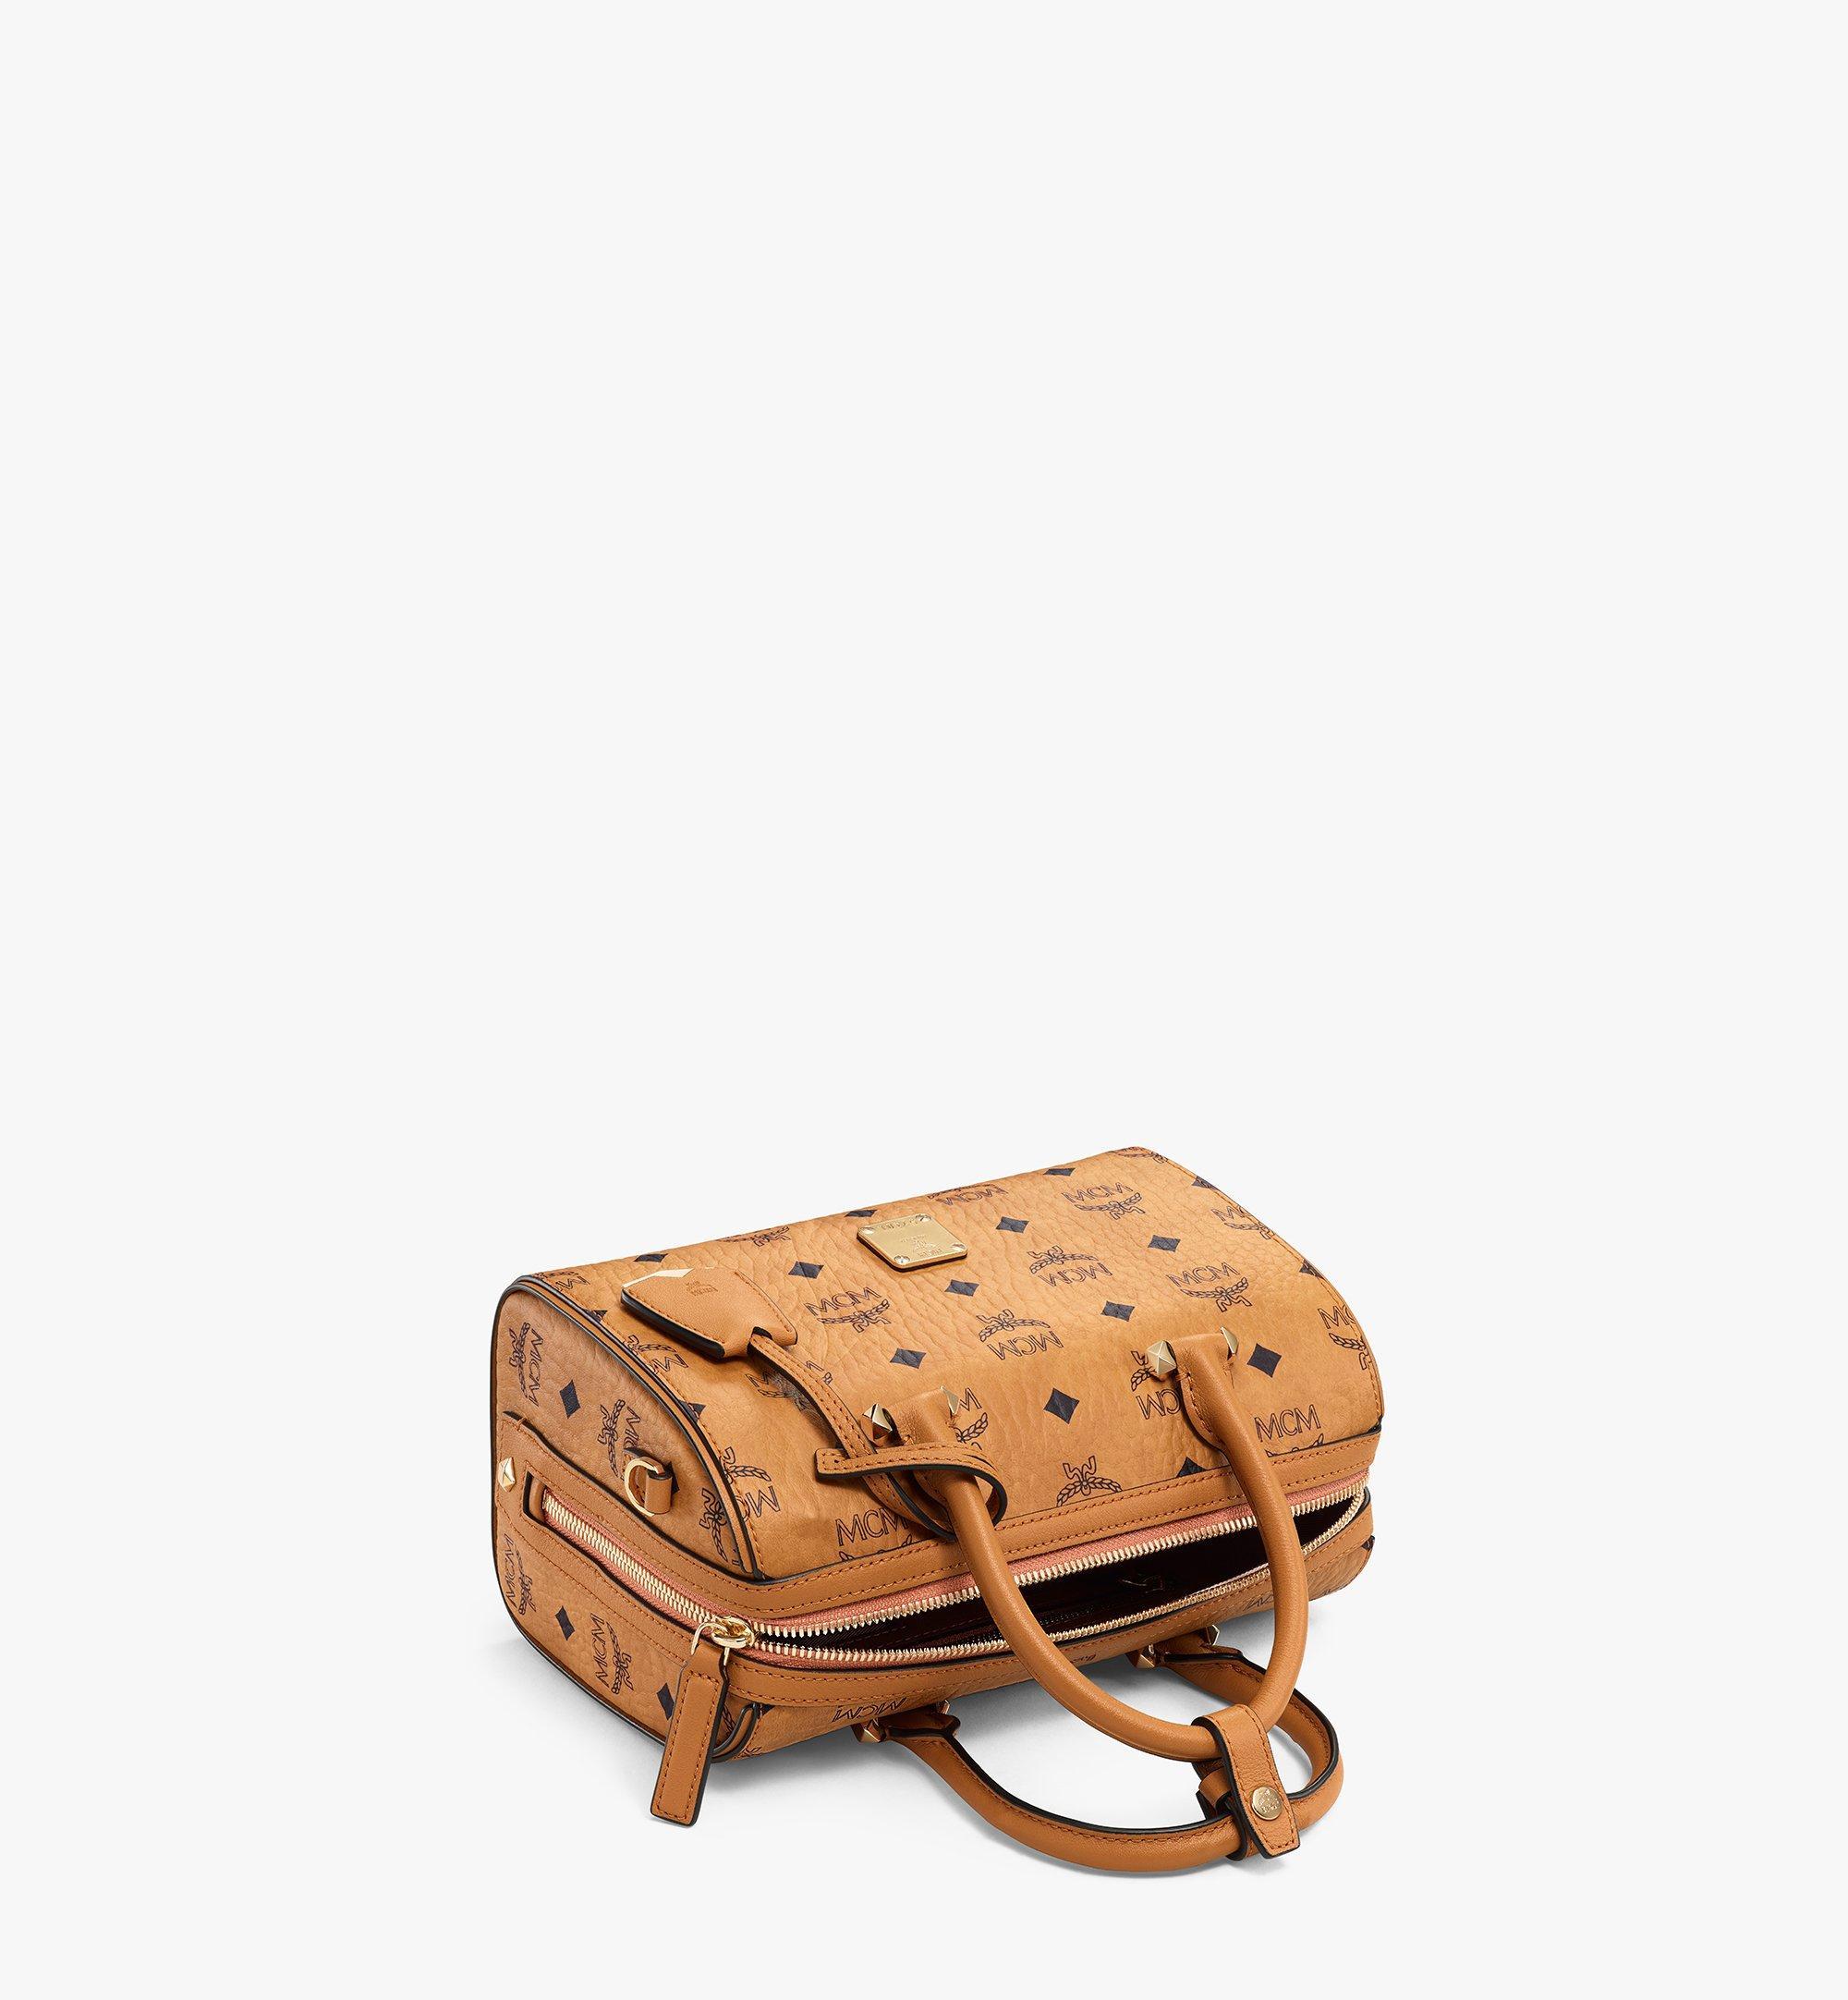 MCM Essential Boston Bag in Visetos Original Cognac MWBAASE02CO001 Alternate View 2